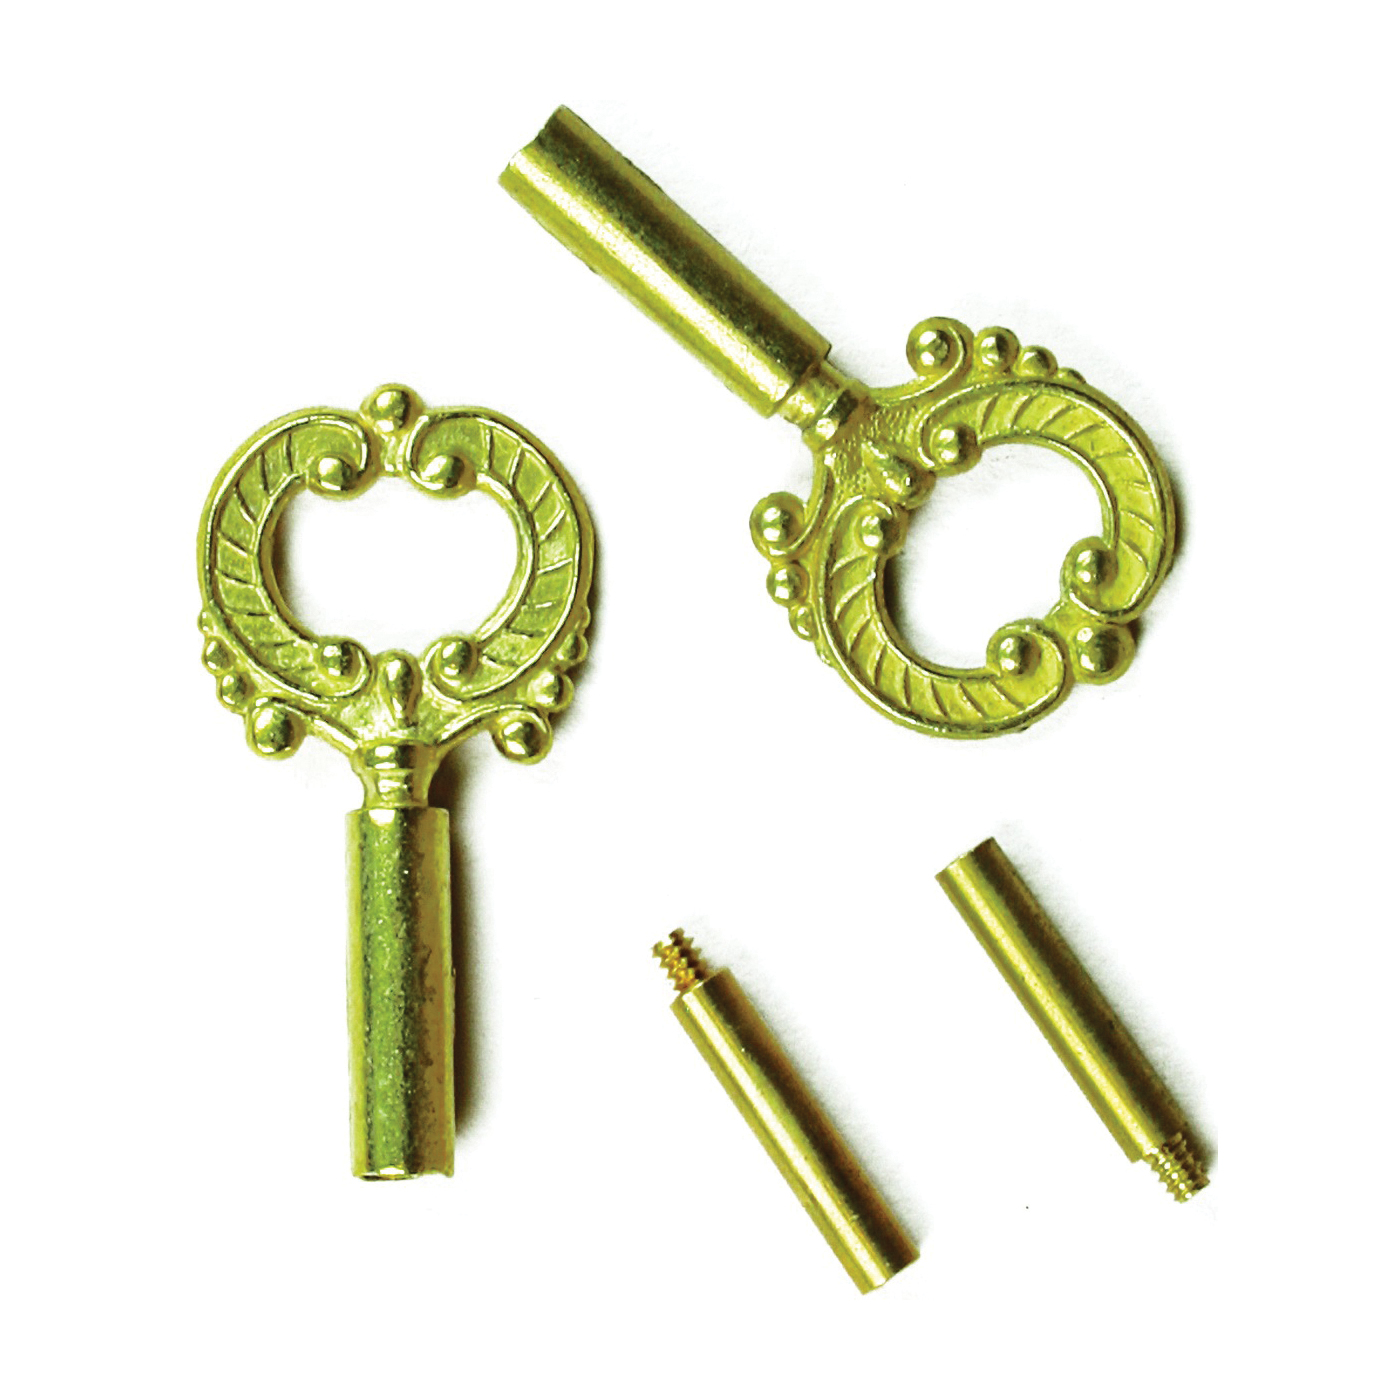 Picture of Jandorf 60142 Socket Keys, Brass